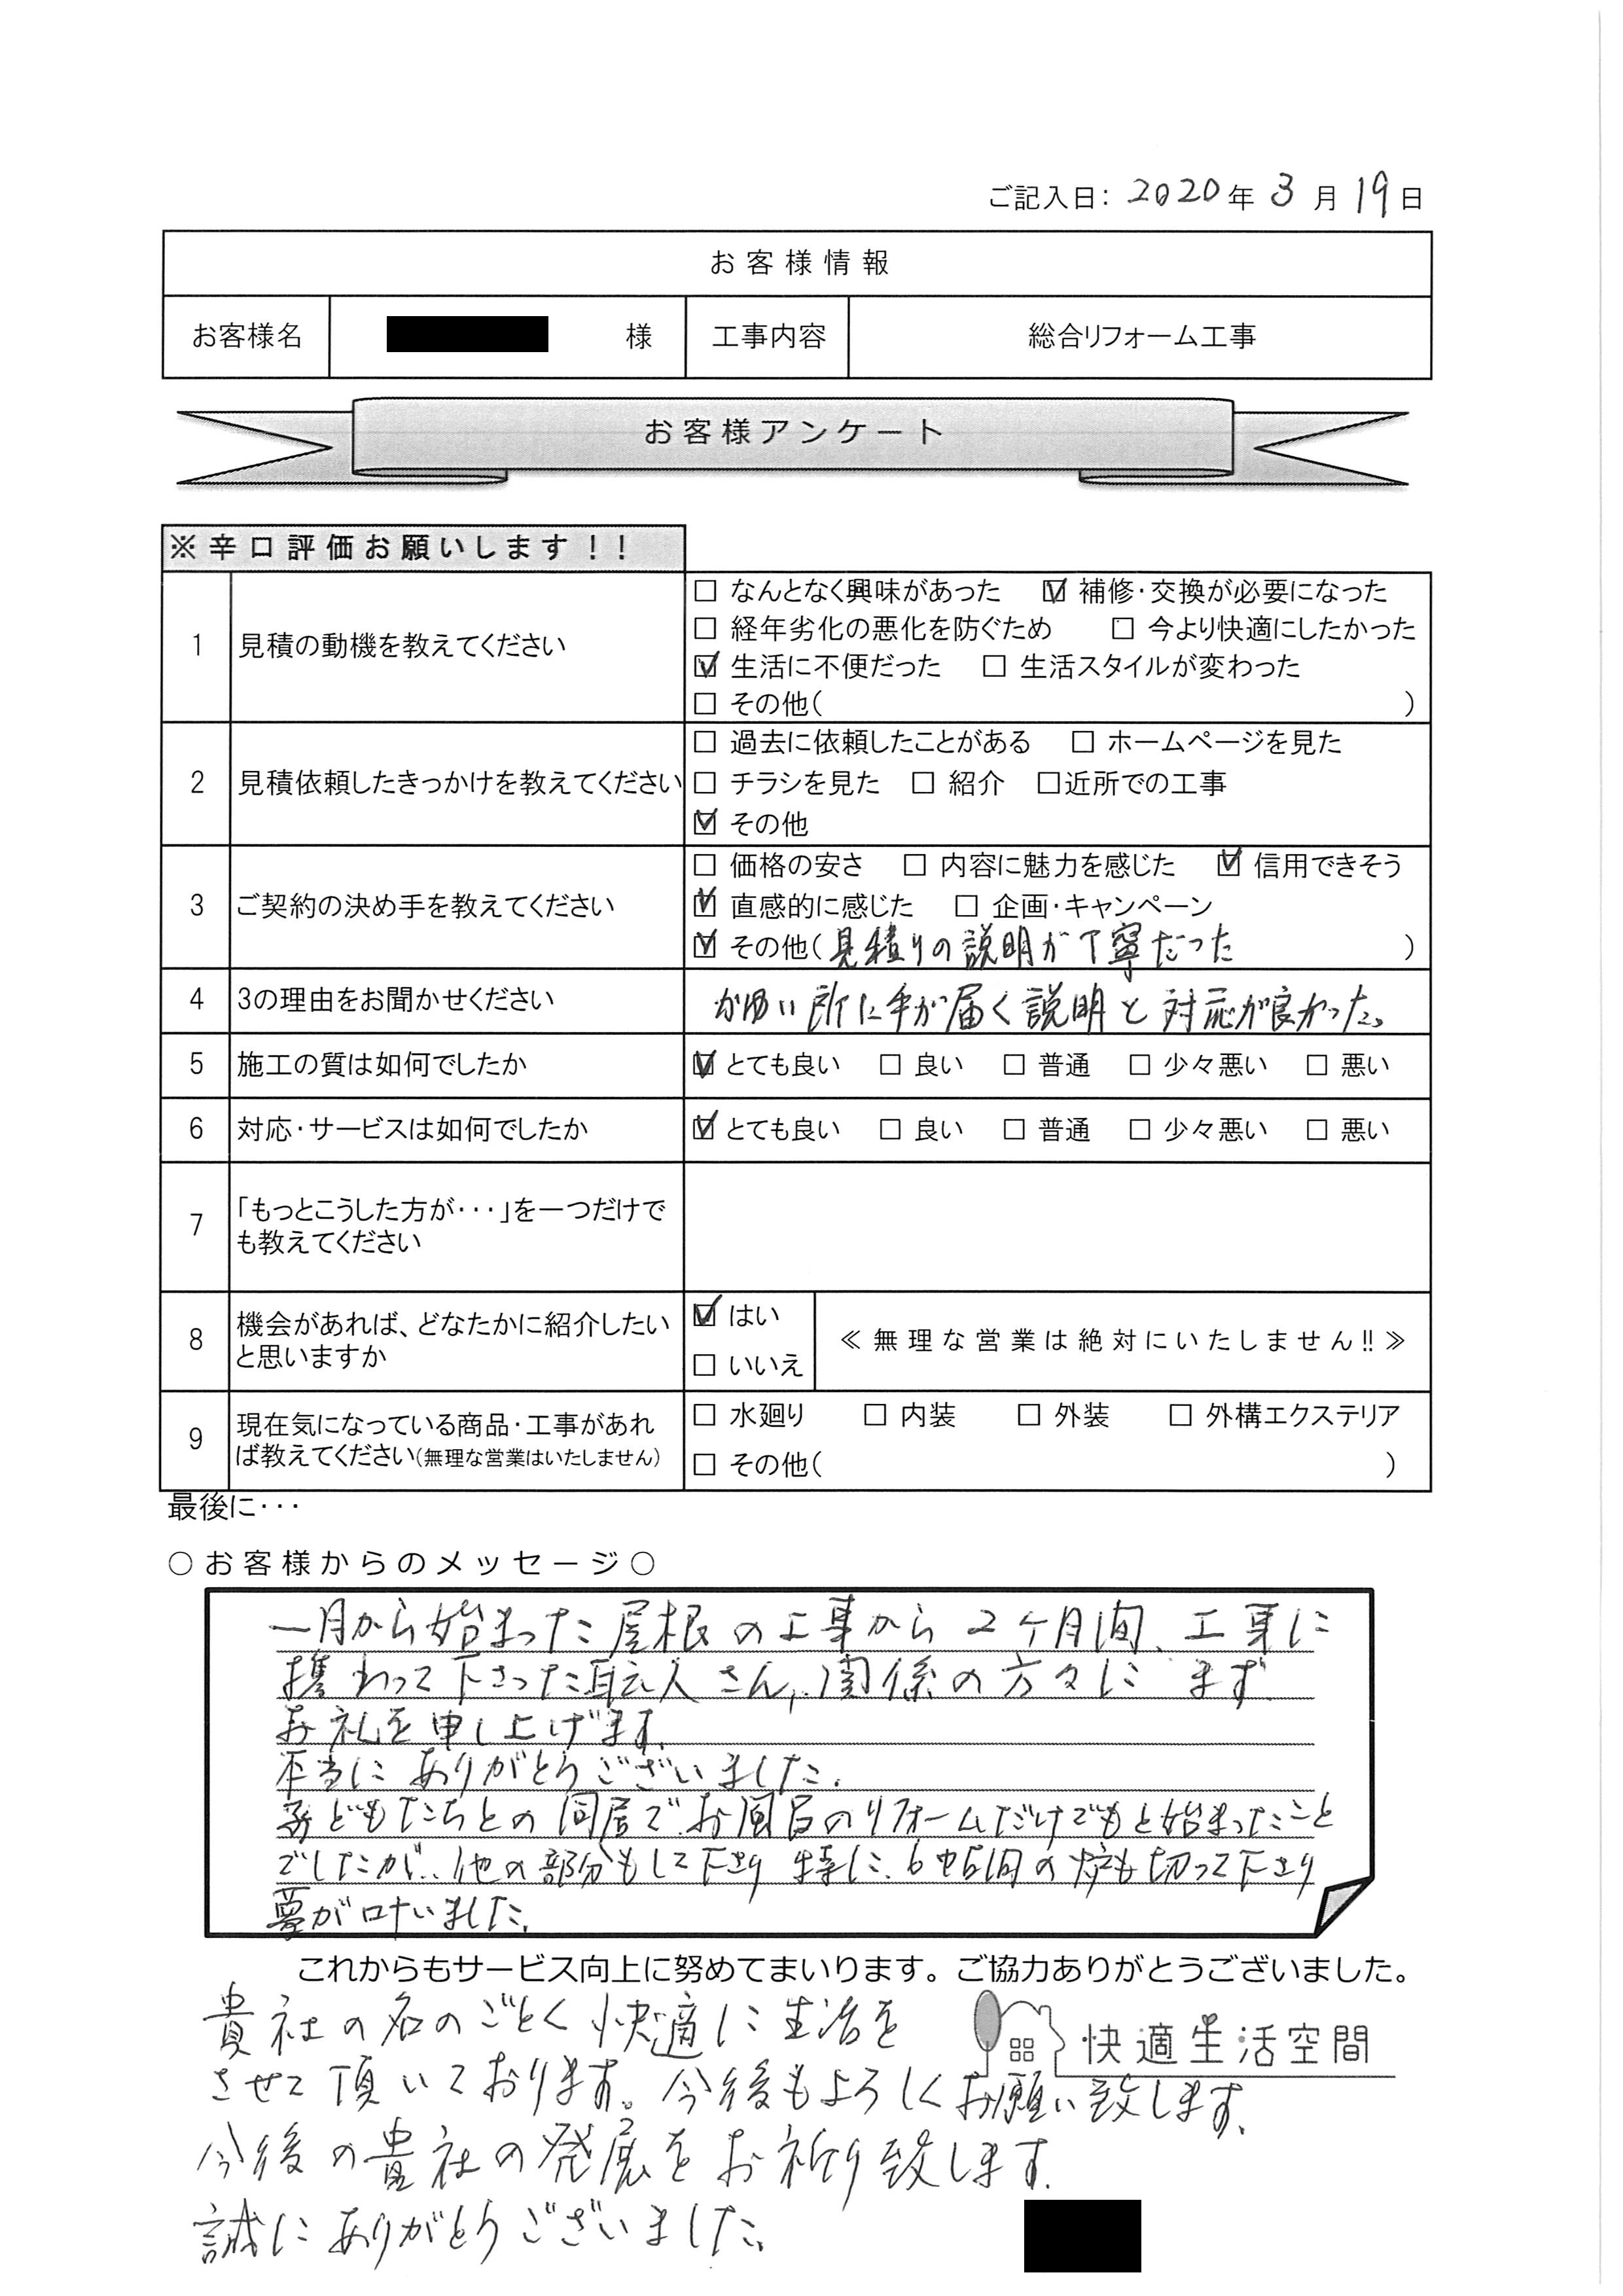 M様邸 総合リフォーム工事アンケート